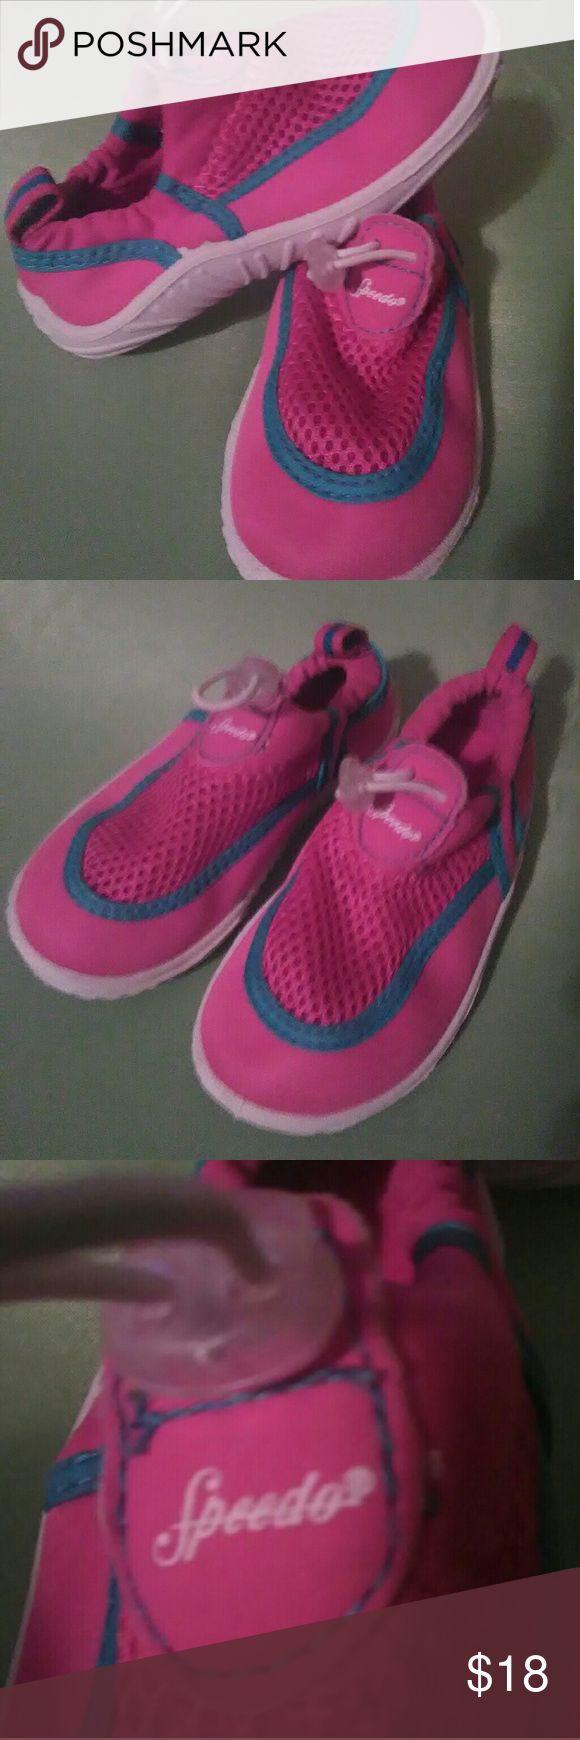 Speedo Girls water shoes In excellent condition. Speedo size L adjustable water/wet shoes. Speedo Shoes Water Shoes